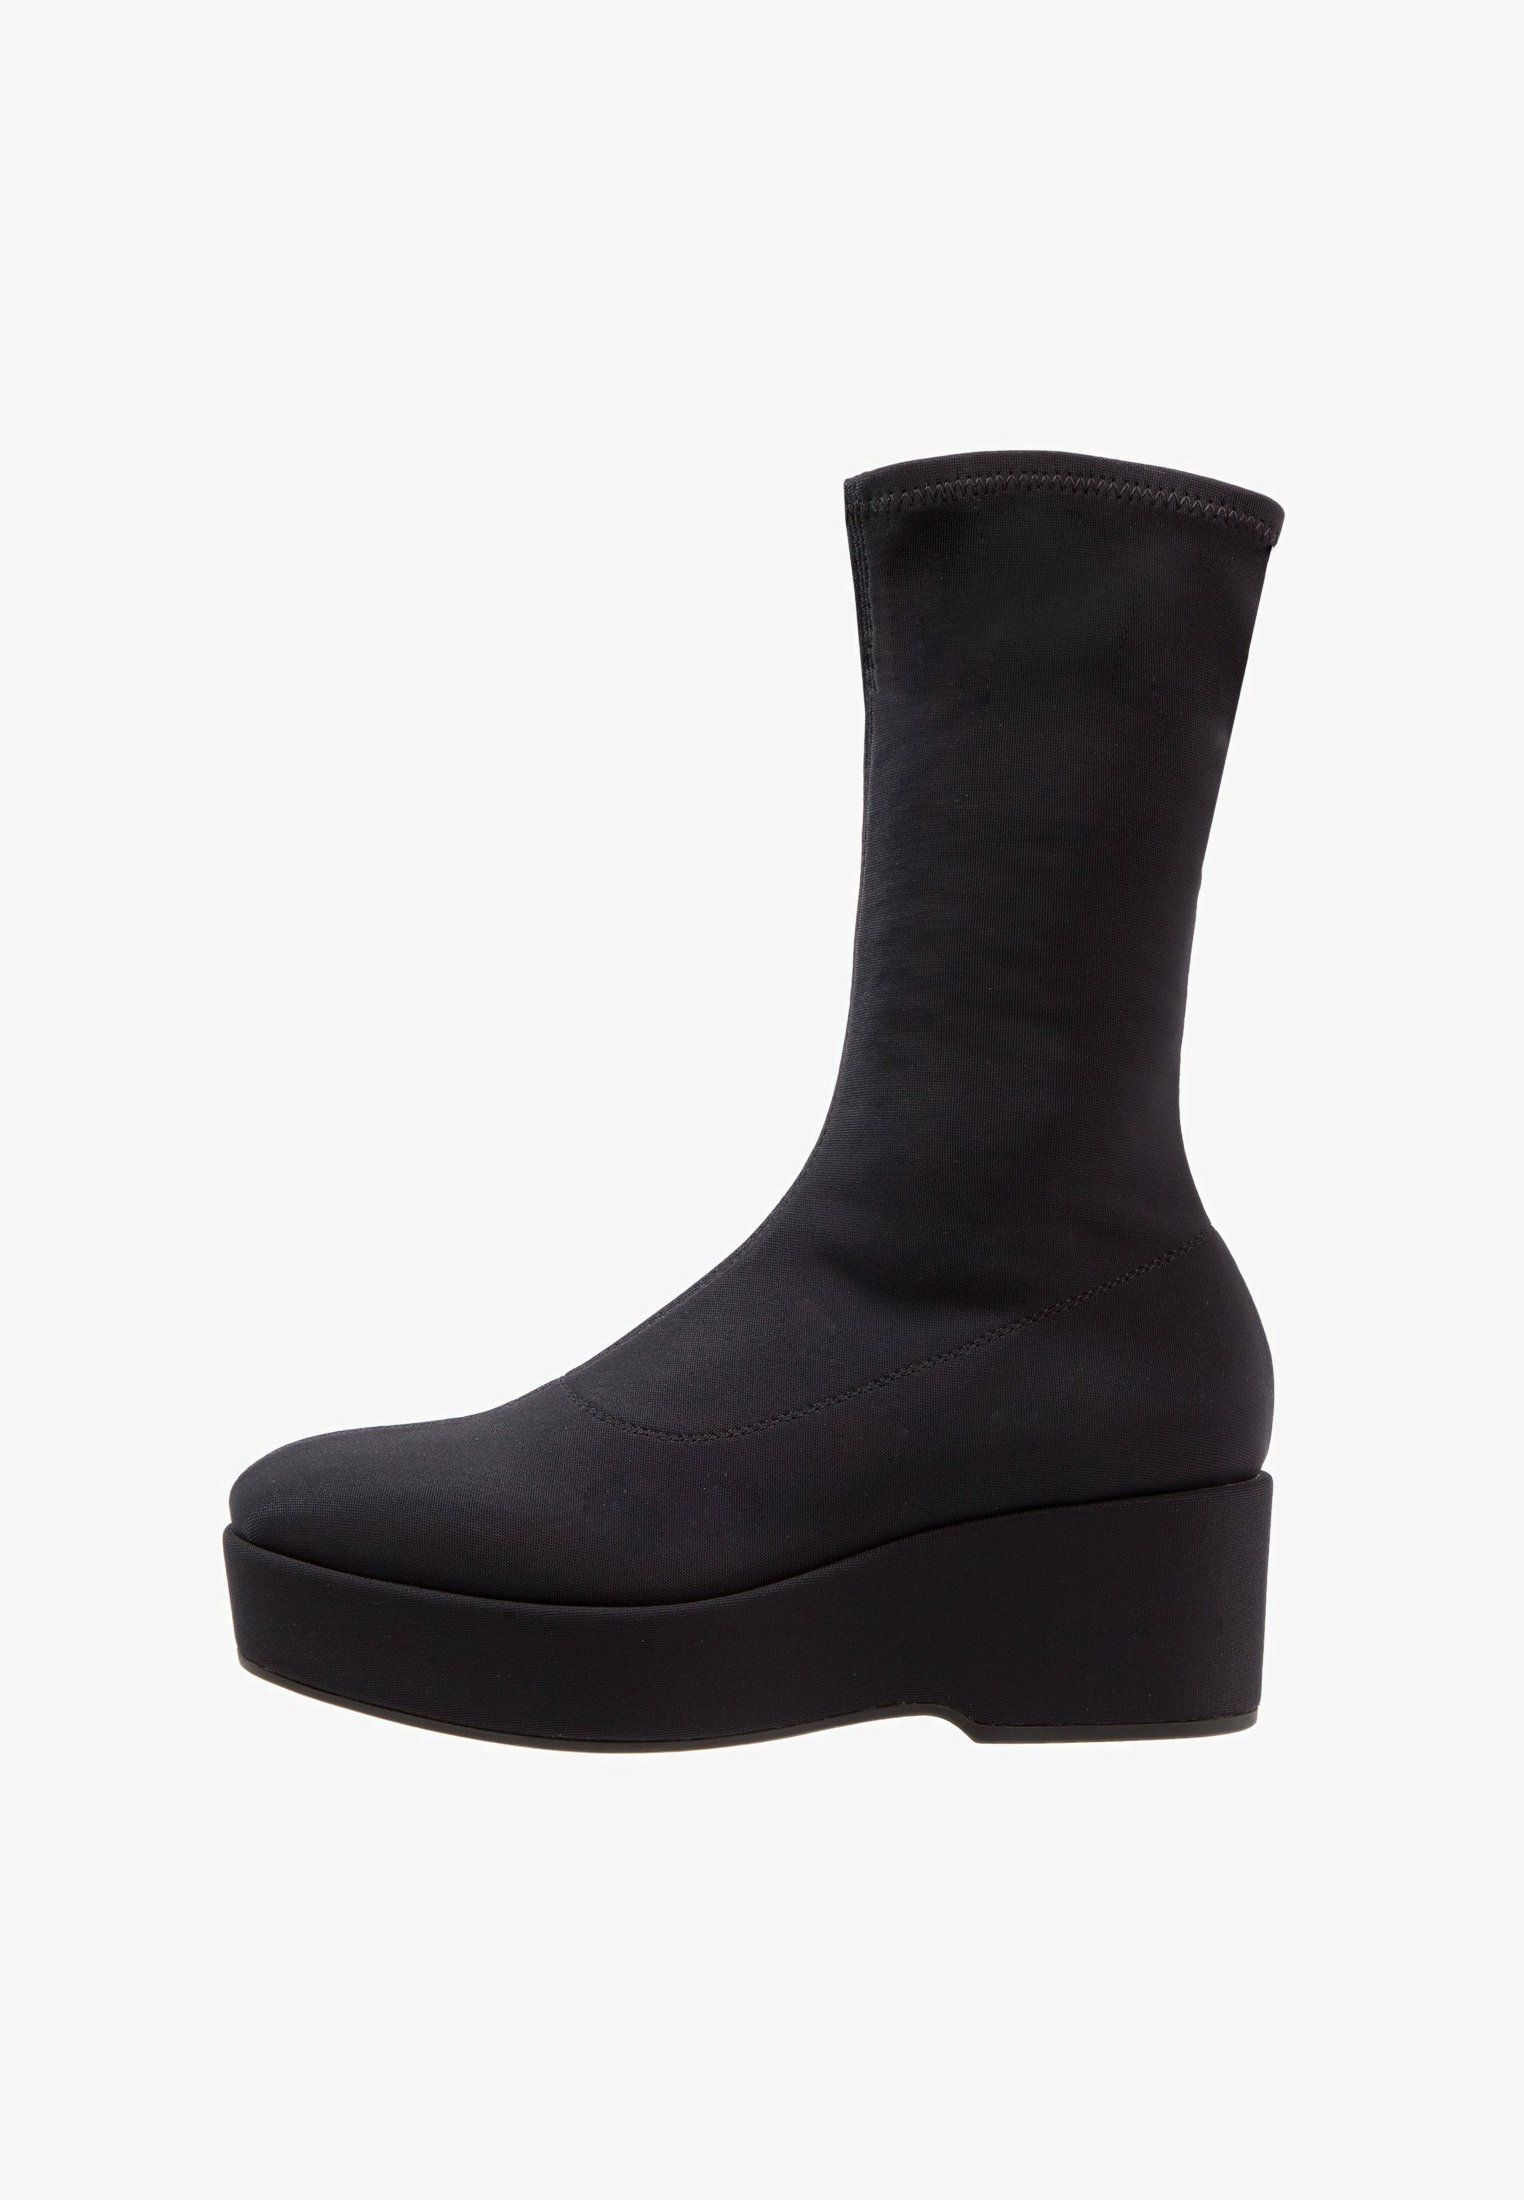 Vagabond Pia Botki Na Platformie Black Zalando Pl 450 Zl Boots Shoes Wedge Boot